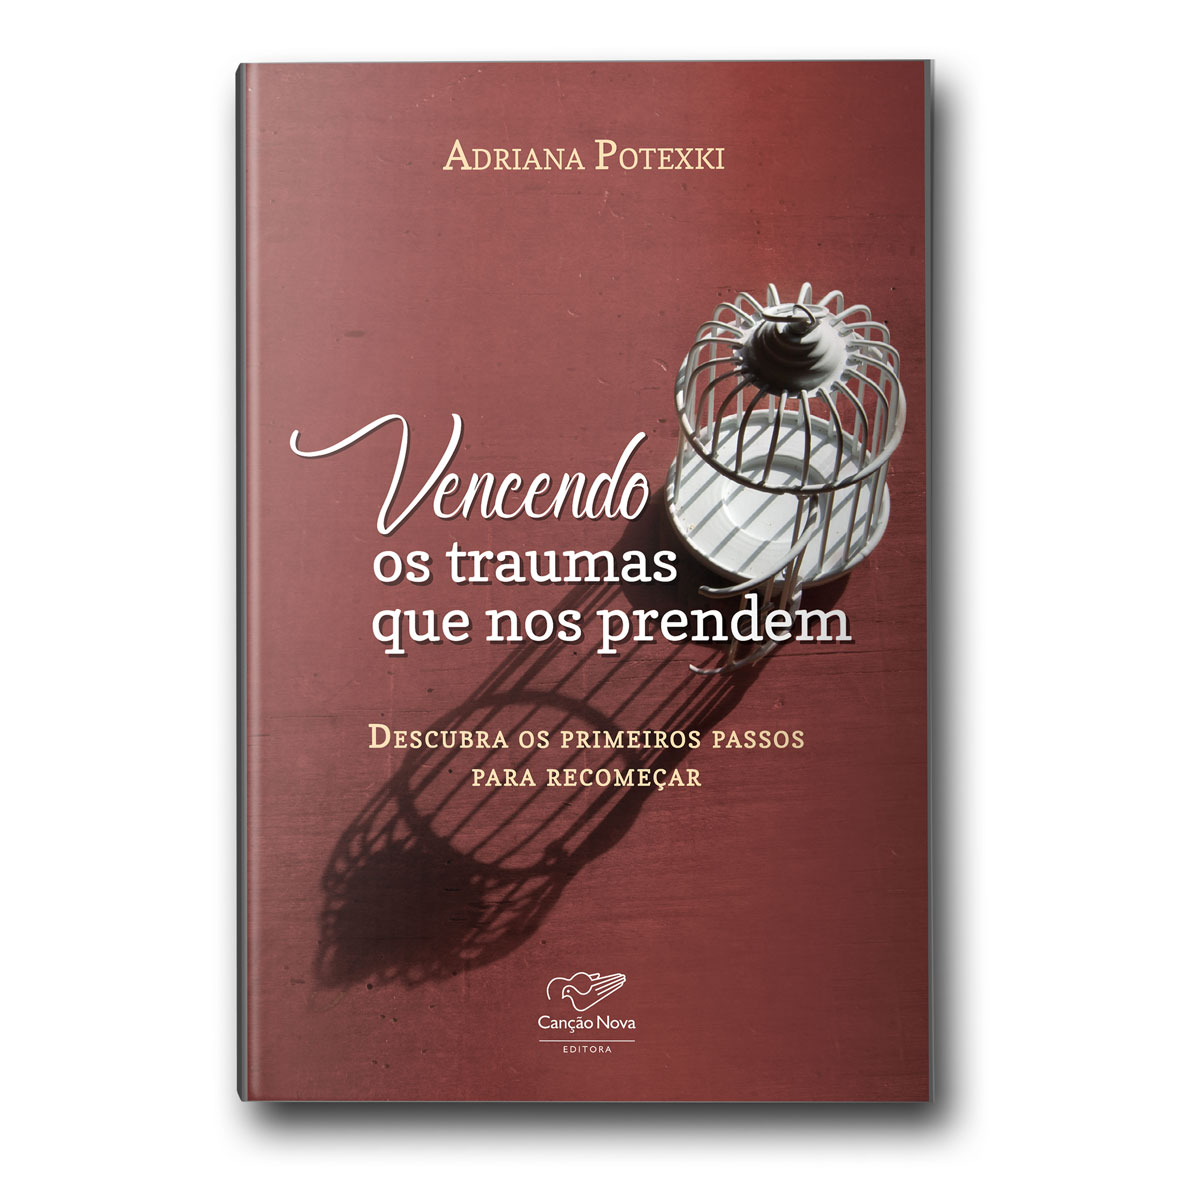 livro adriana potexki